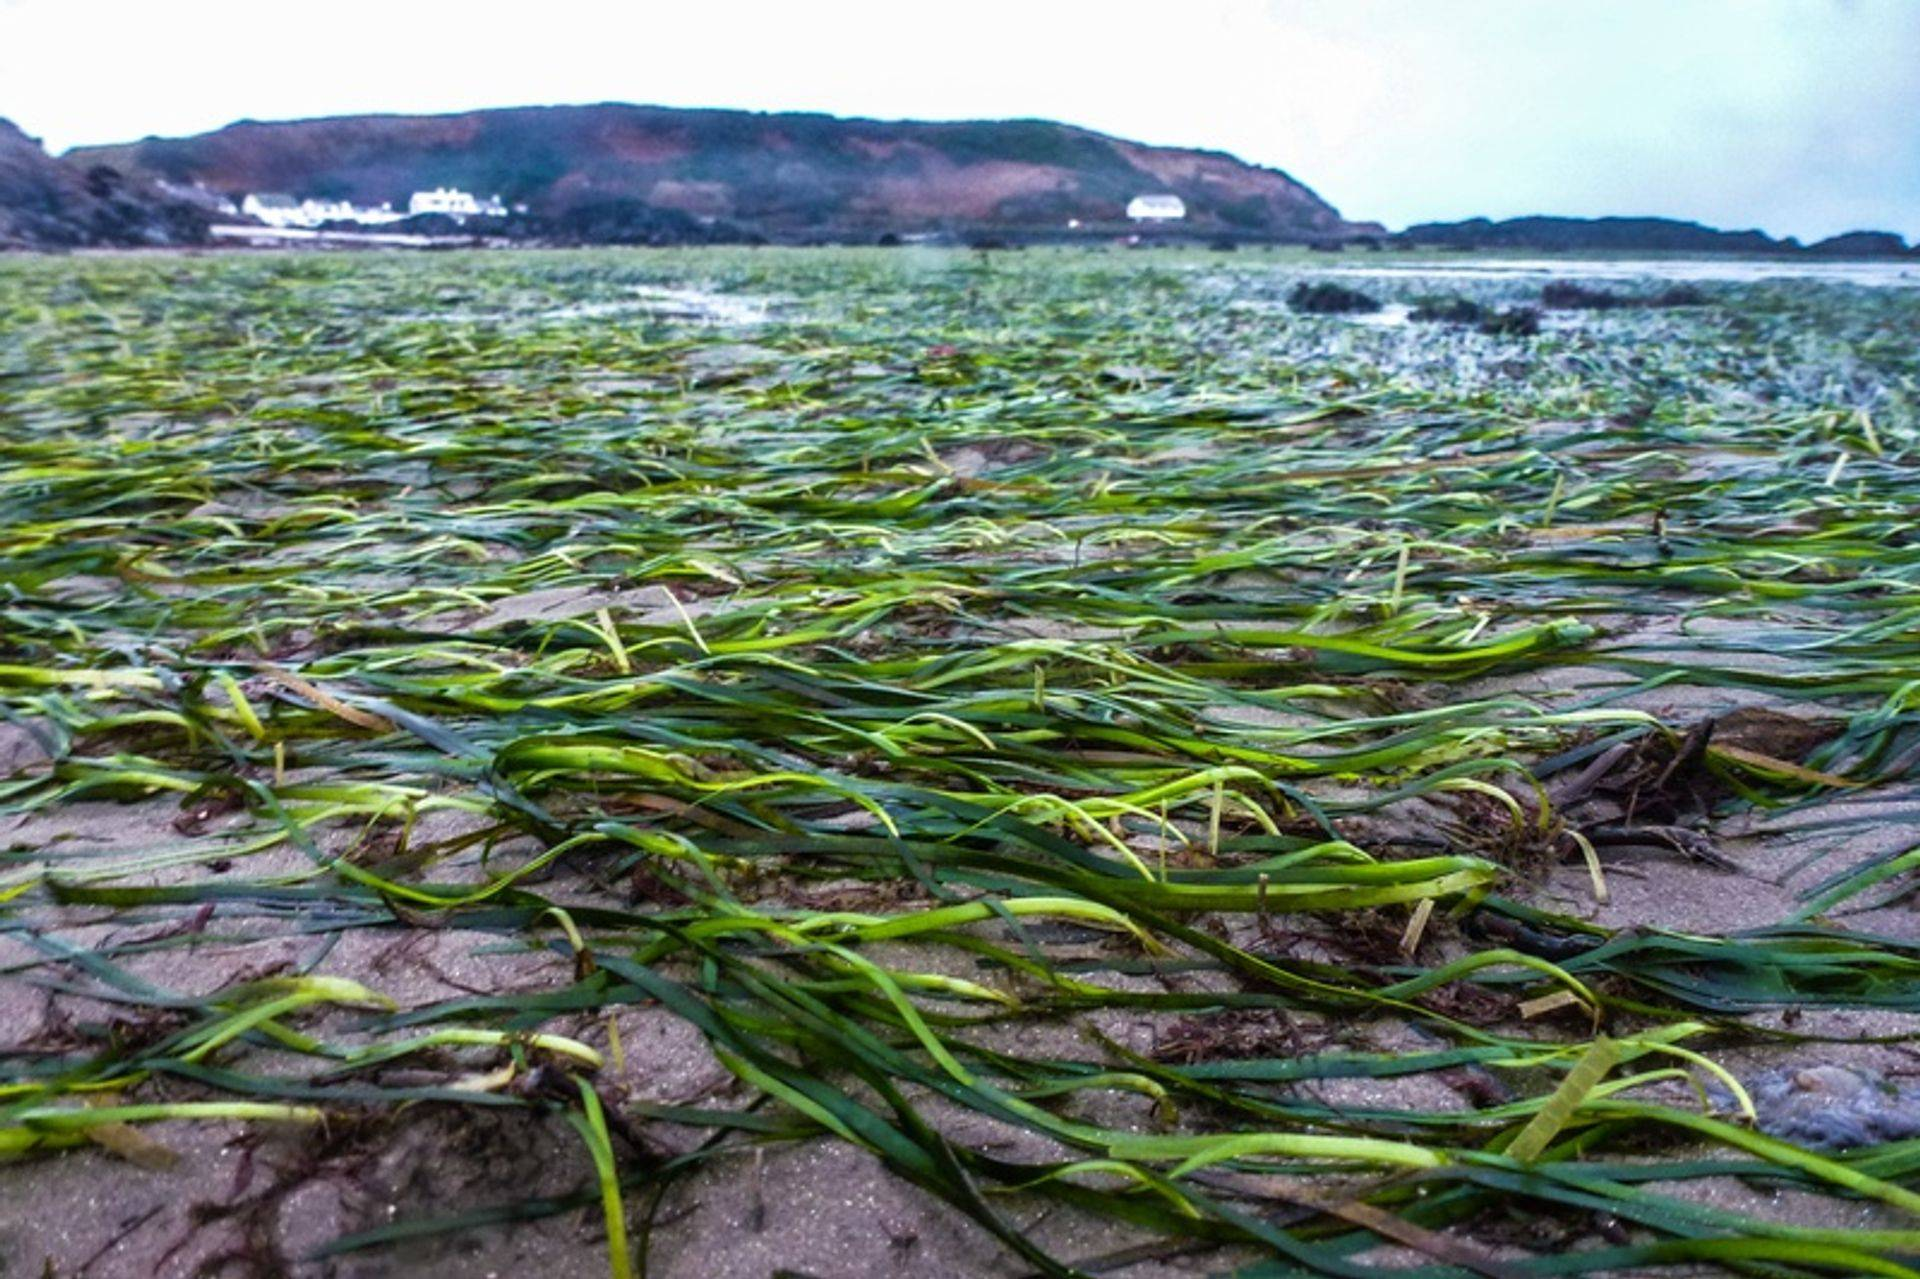 A Zostera marina (eelgrass) seagrass meadow in Porthdinllaen, Wales.